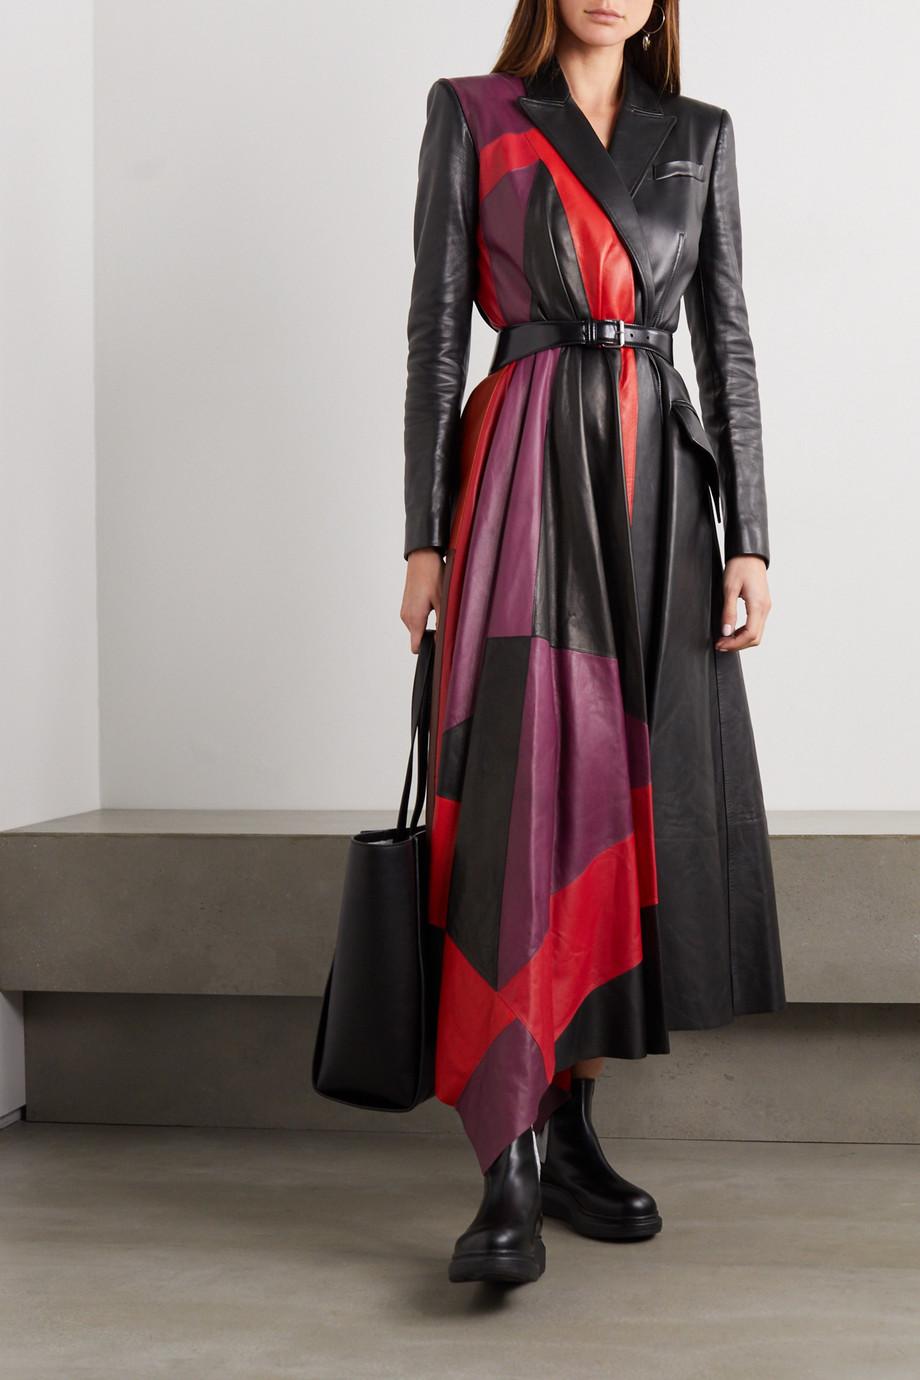 Alexander McQueen Asymmetric color-block leather coat